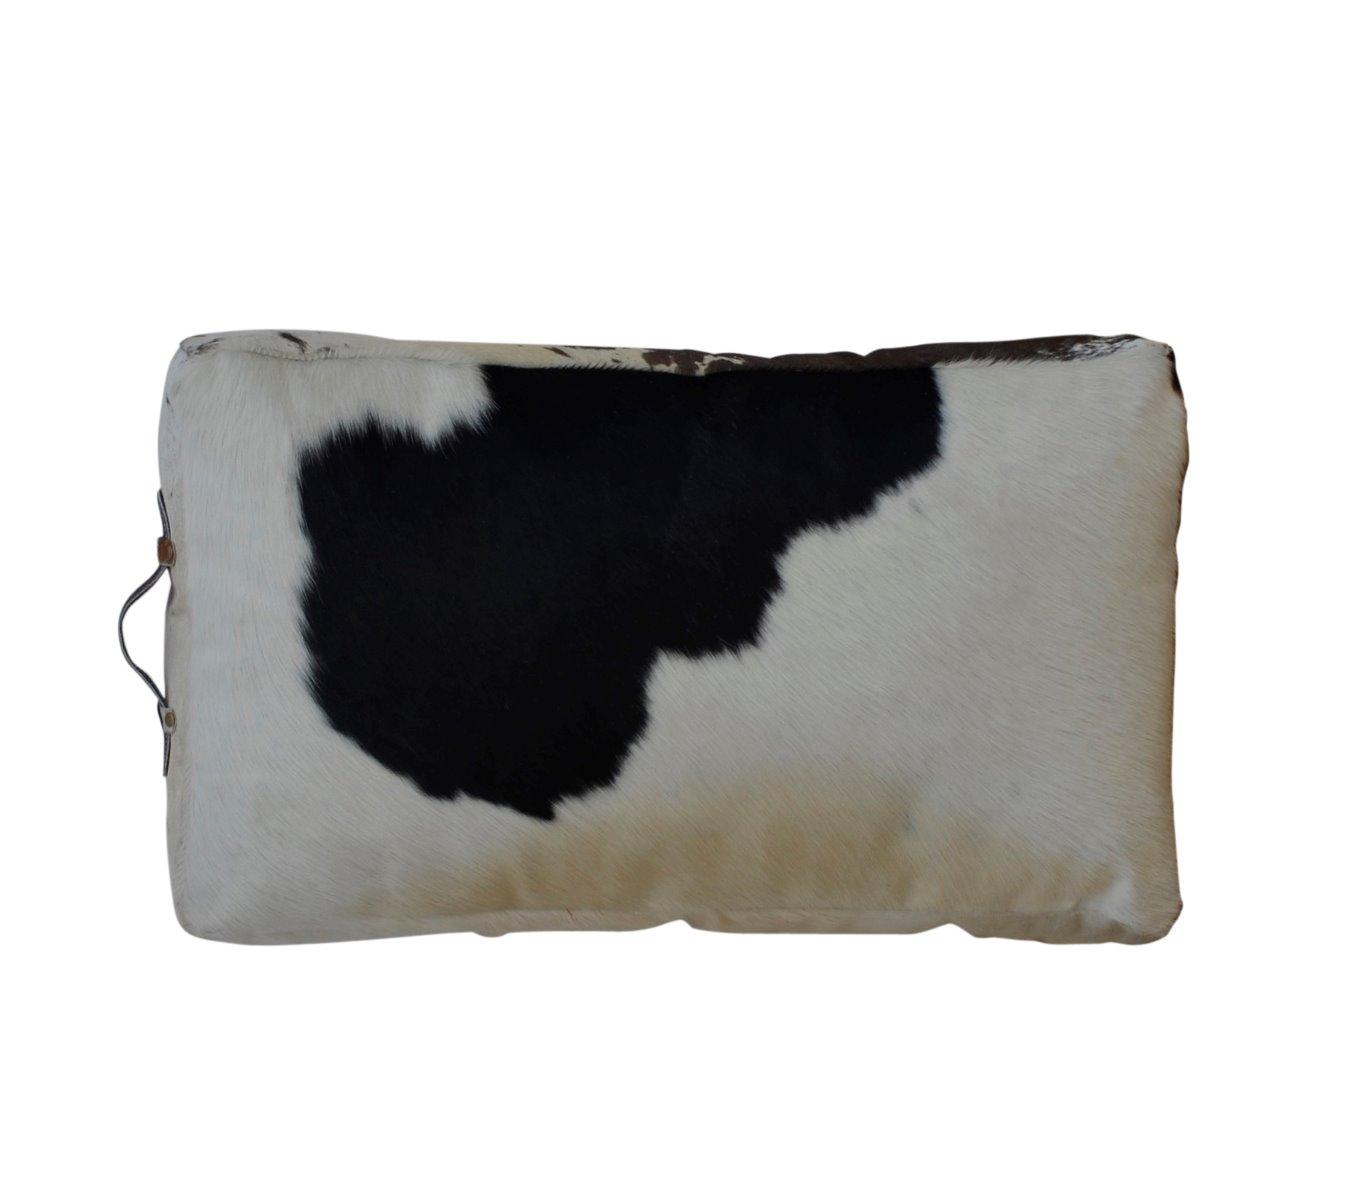 Stoel - Poefs - Floor pouf cow leather